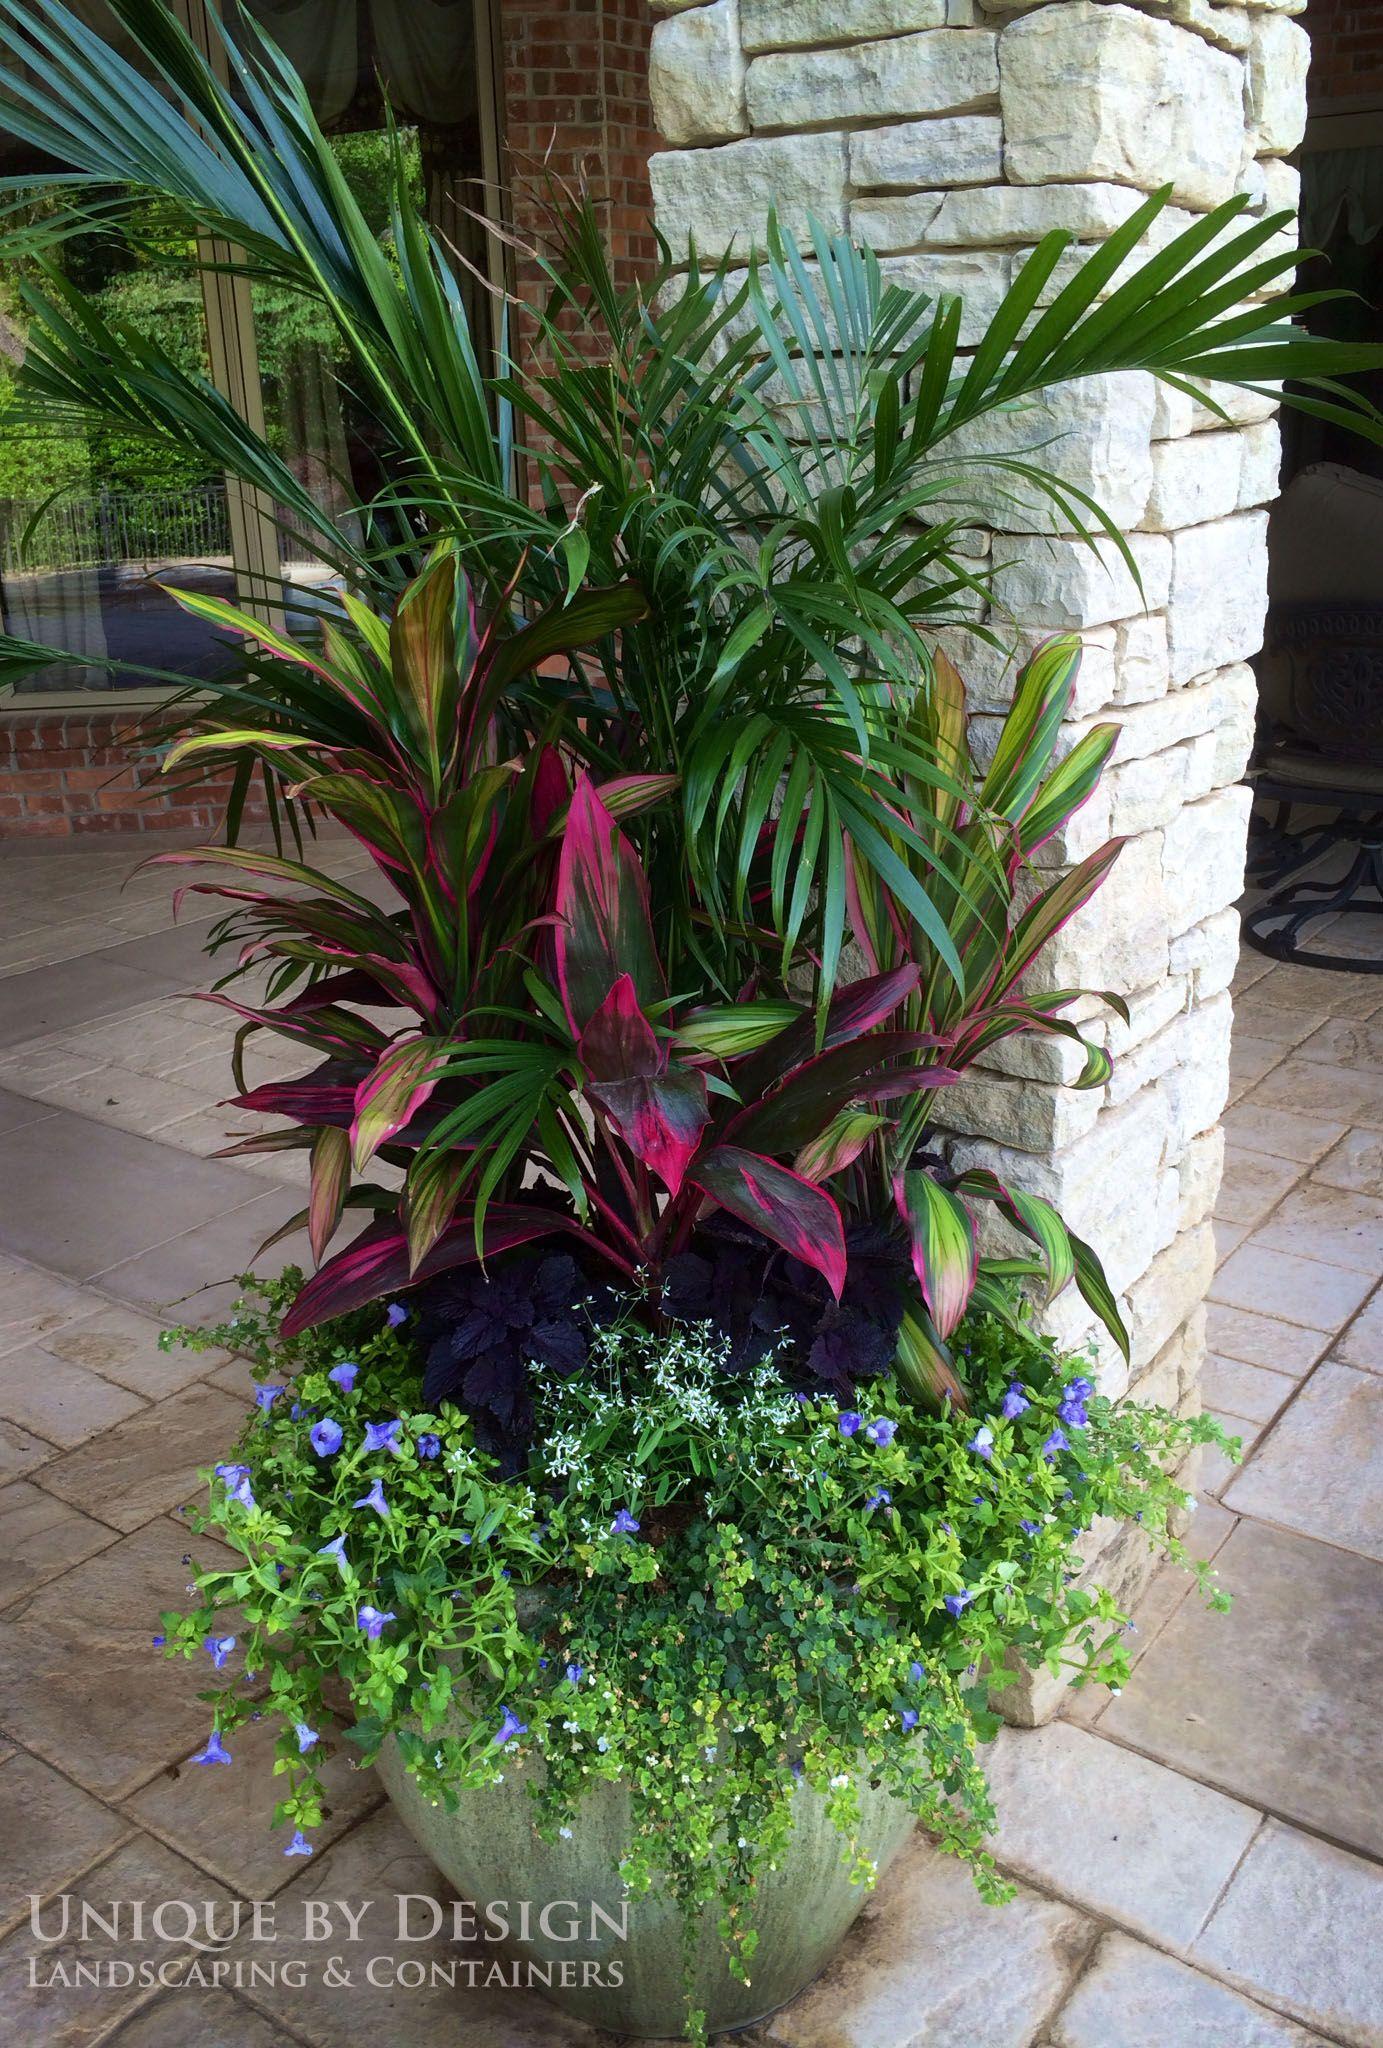 Planter Herbes Aromatiques Jardiniere uniquedesign l helen weis | jardins | bambous jardin